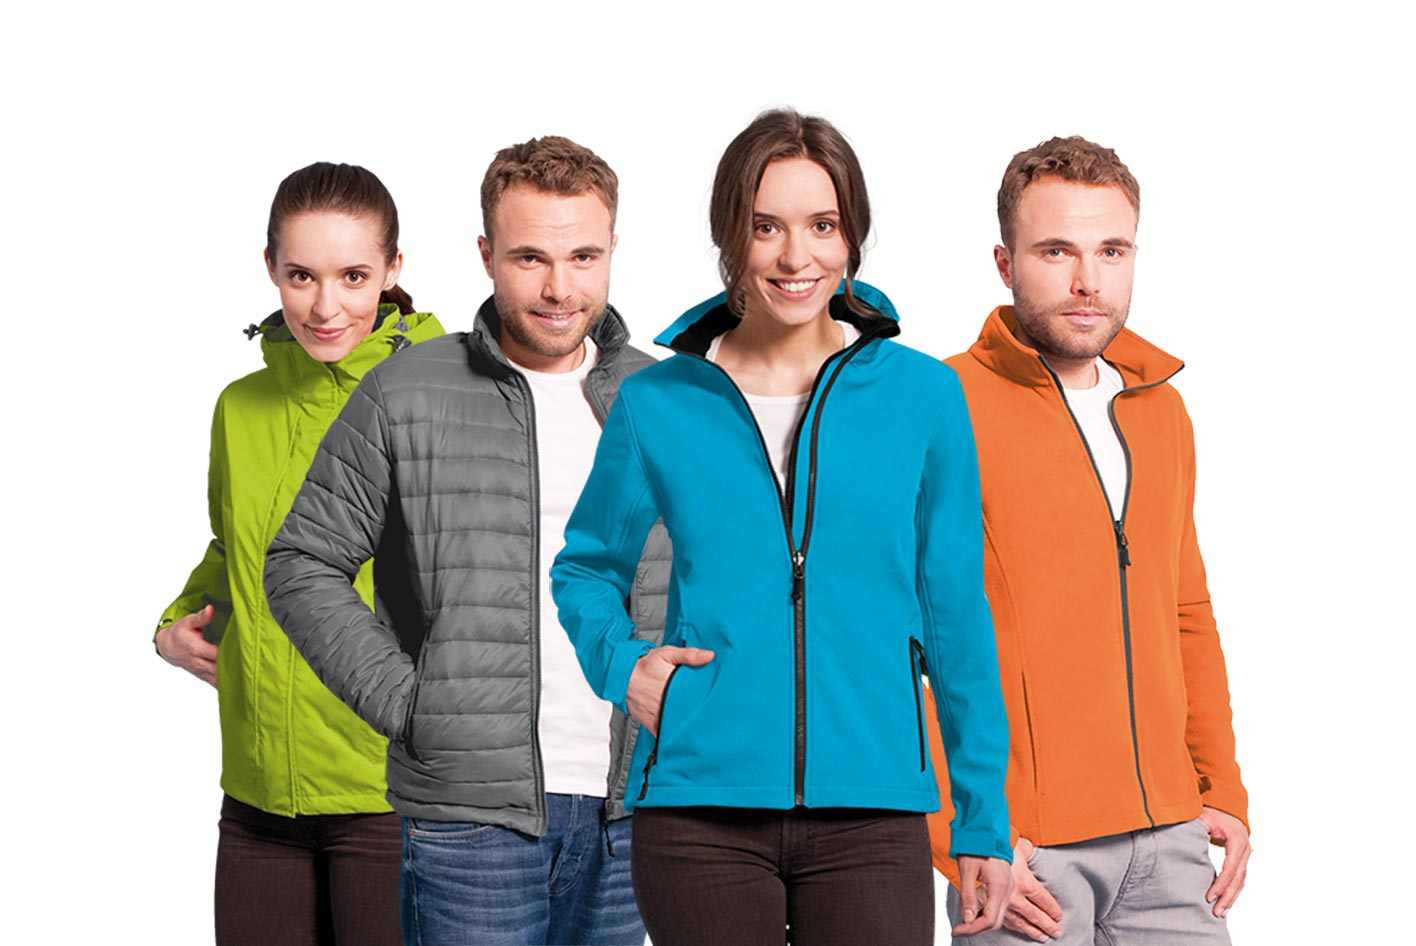 thumb-promodoro_4-in-1-jacket.jpg